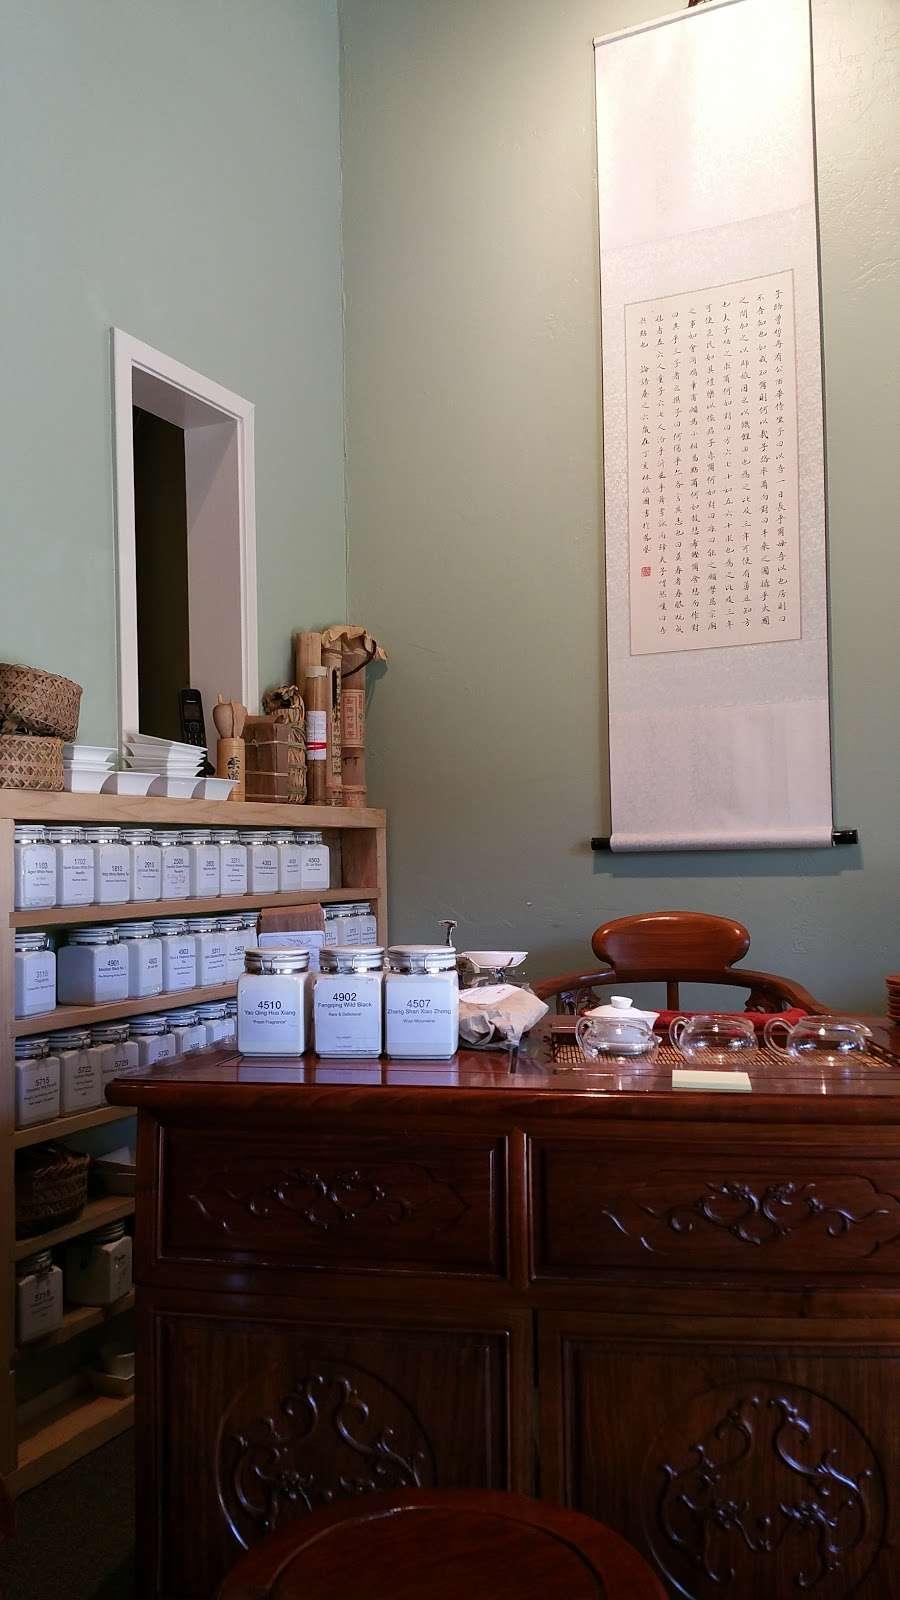 Tea Museum & The Phoenix Collection - museum  | Photo 9 of 10 | Address: 7282 Sir Francis Drake Blvd, Lagunitas, CA 94938, USA | Phone: (415) 488-9017